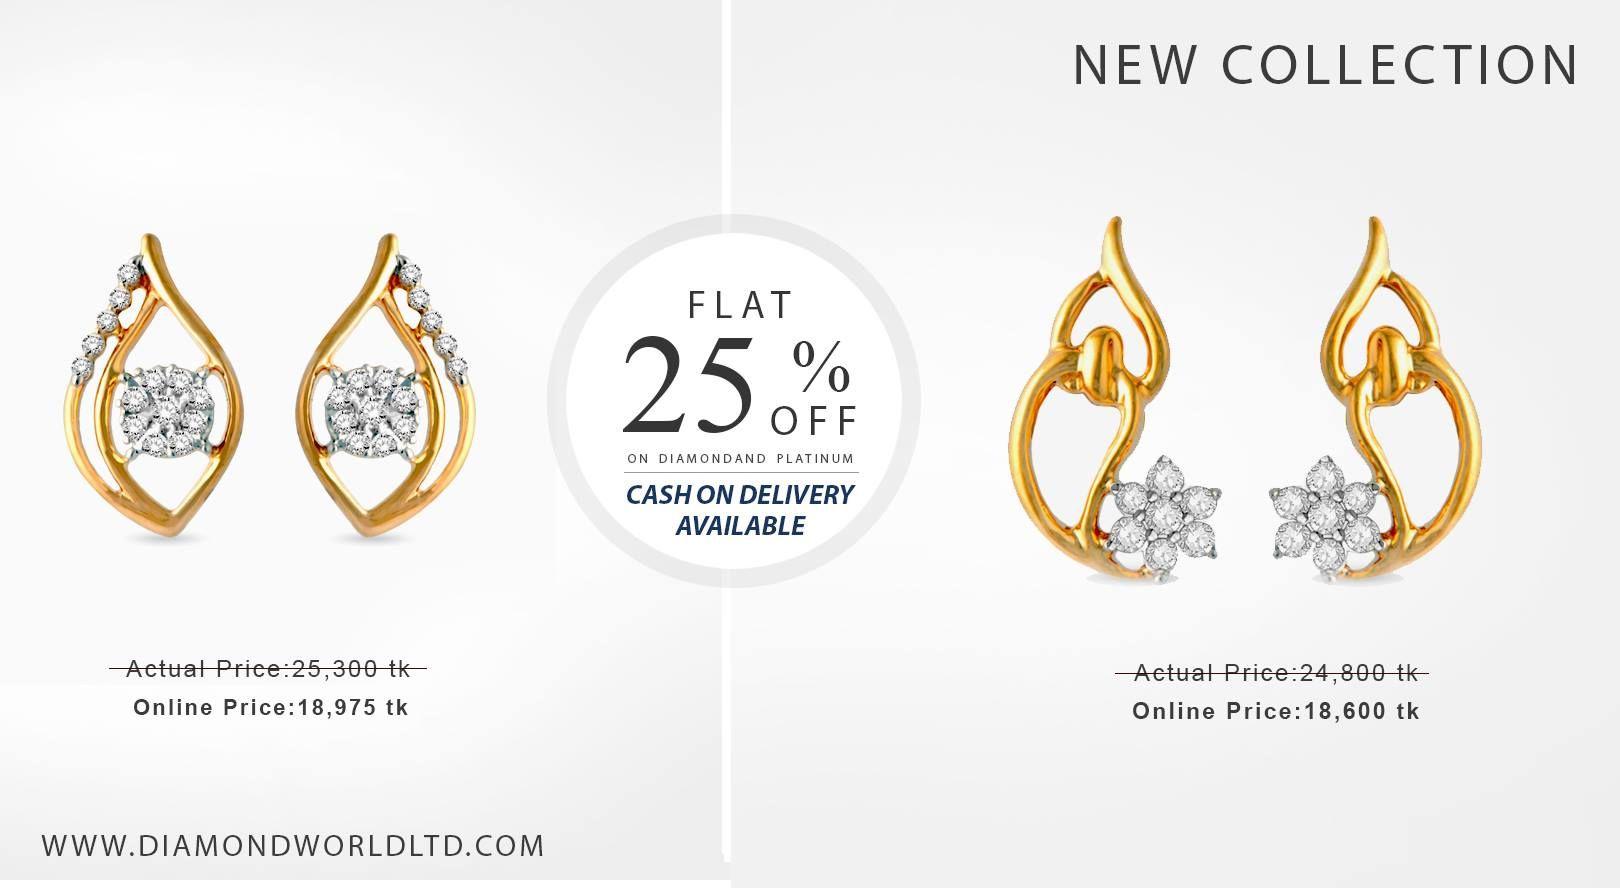 Stunning Diamond Earrings At Amazing Prices! Buy Now:  Diamondworldltd